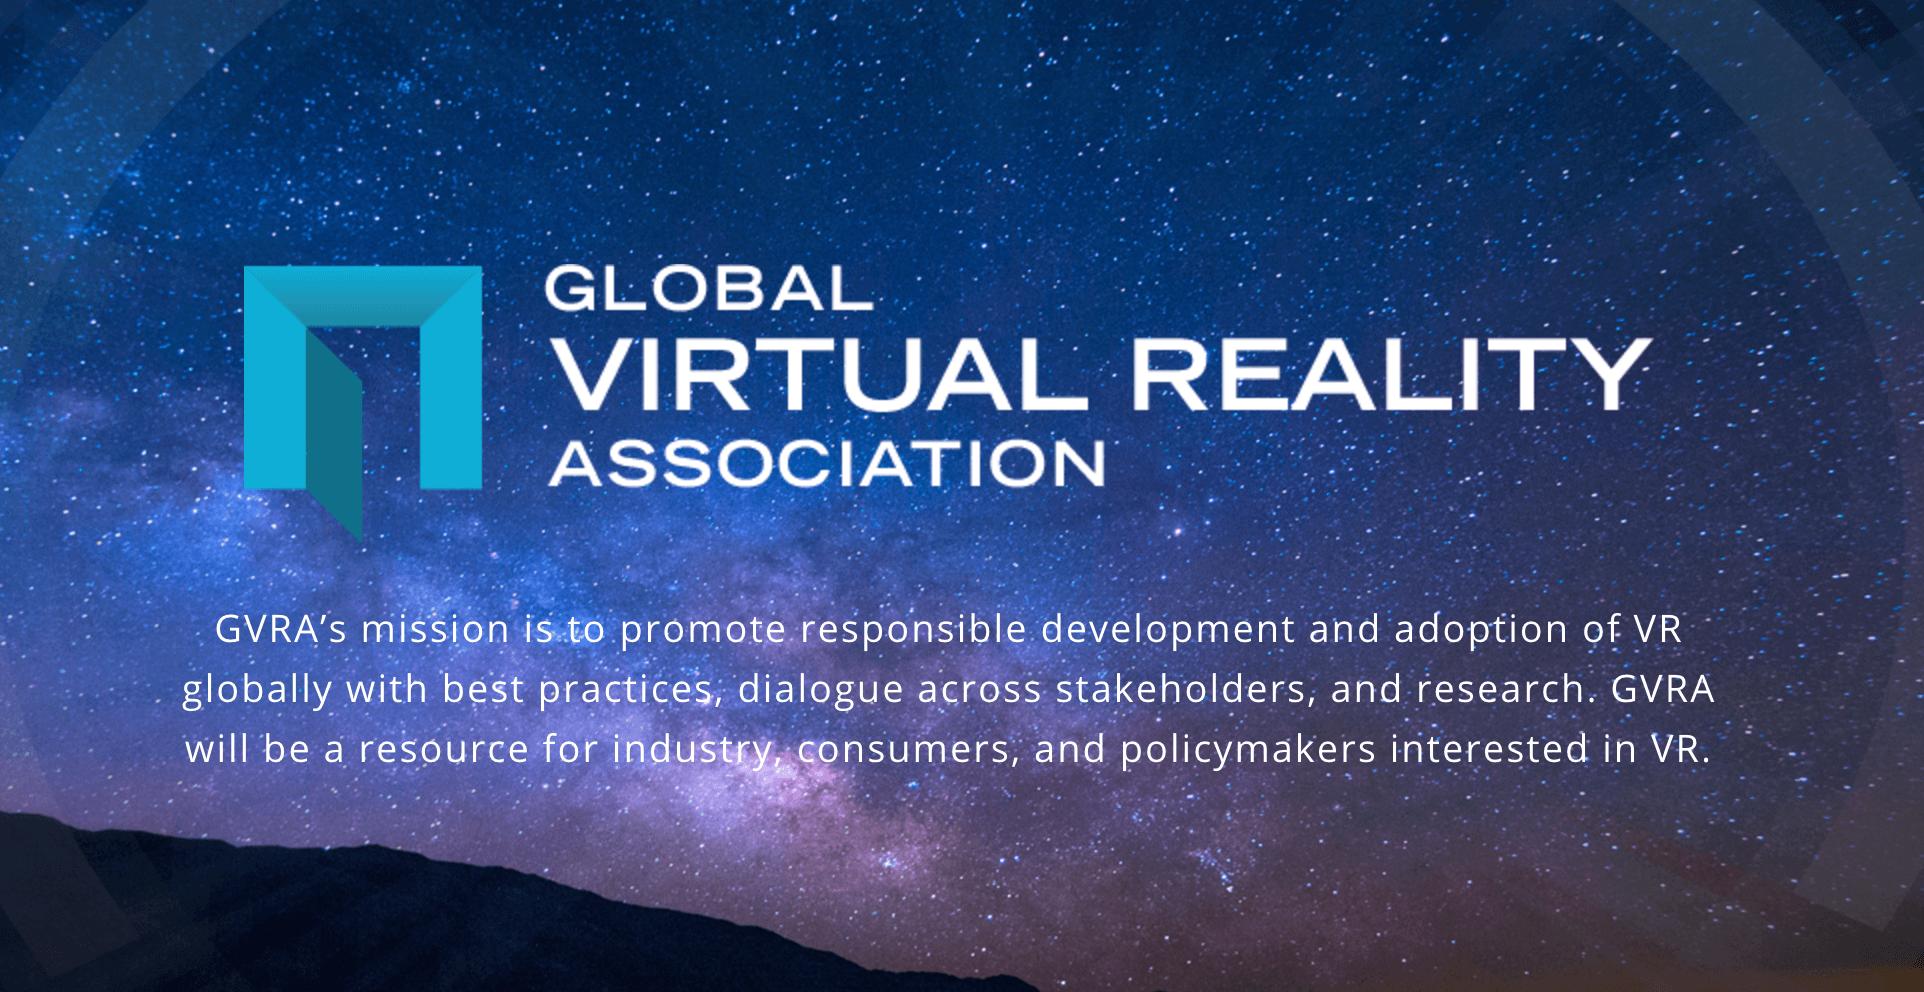 Global Virtual Reality Association (GVRA)